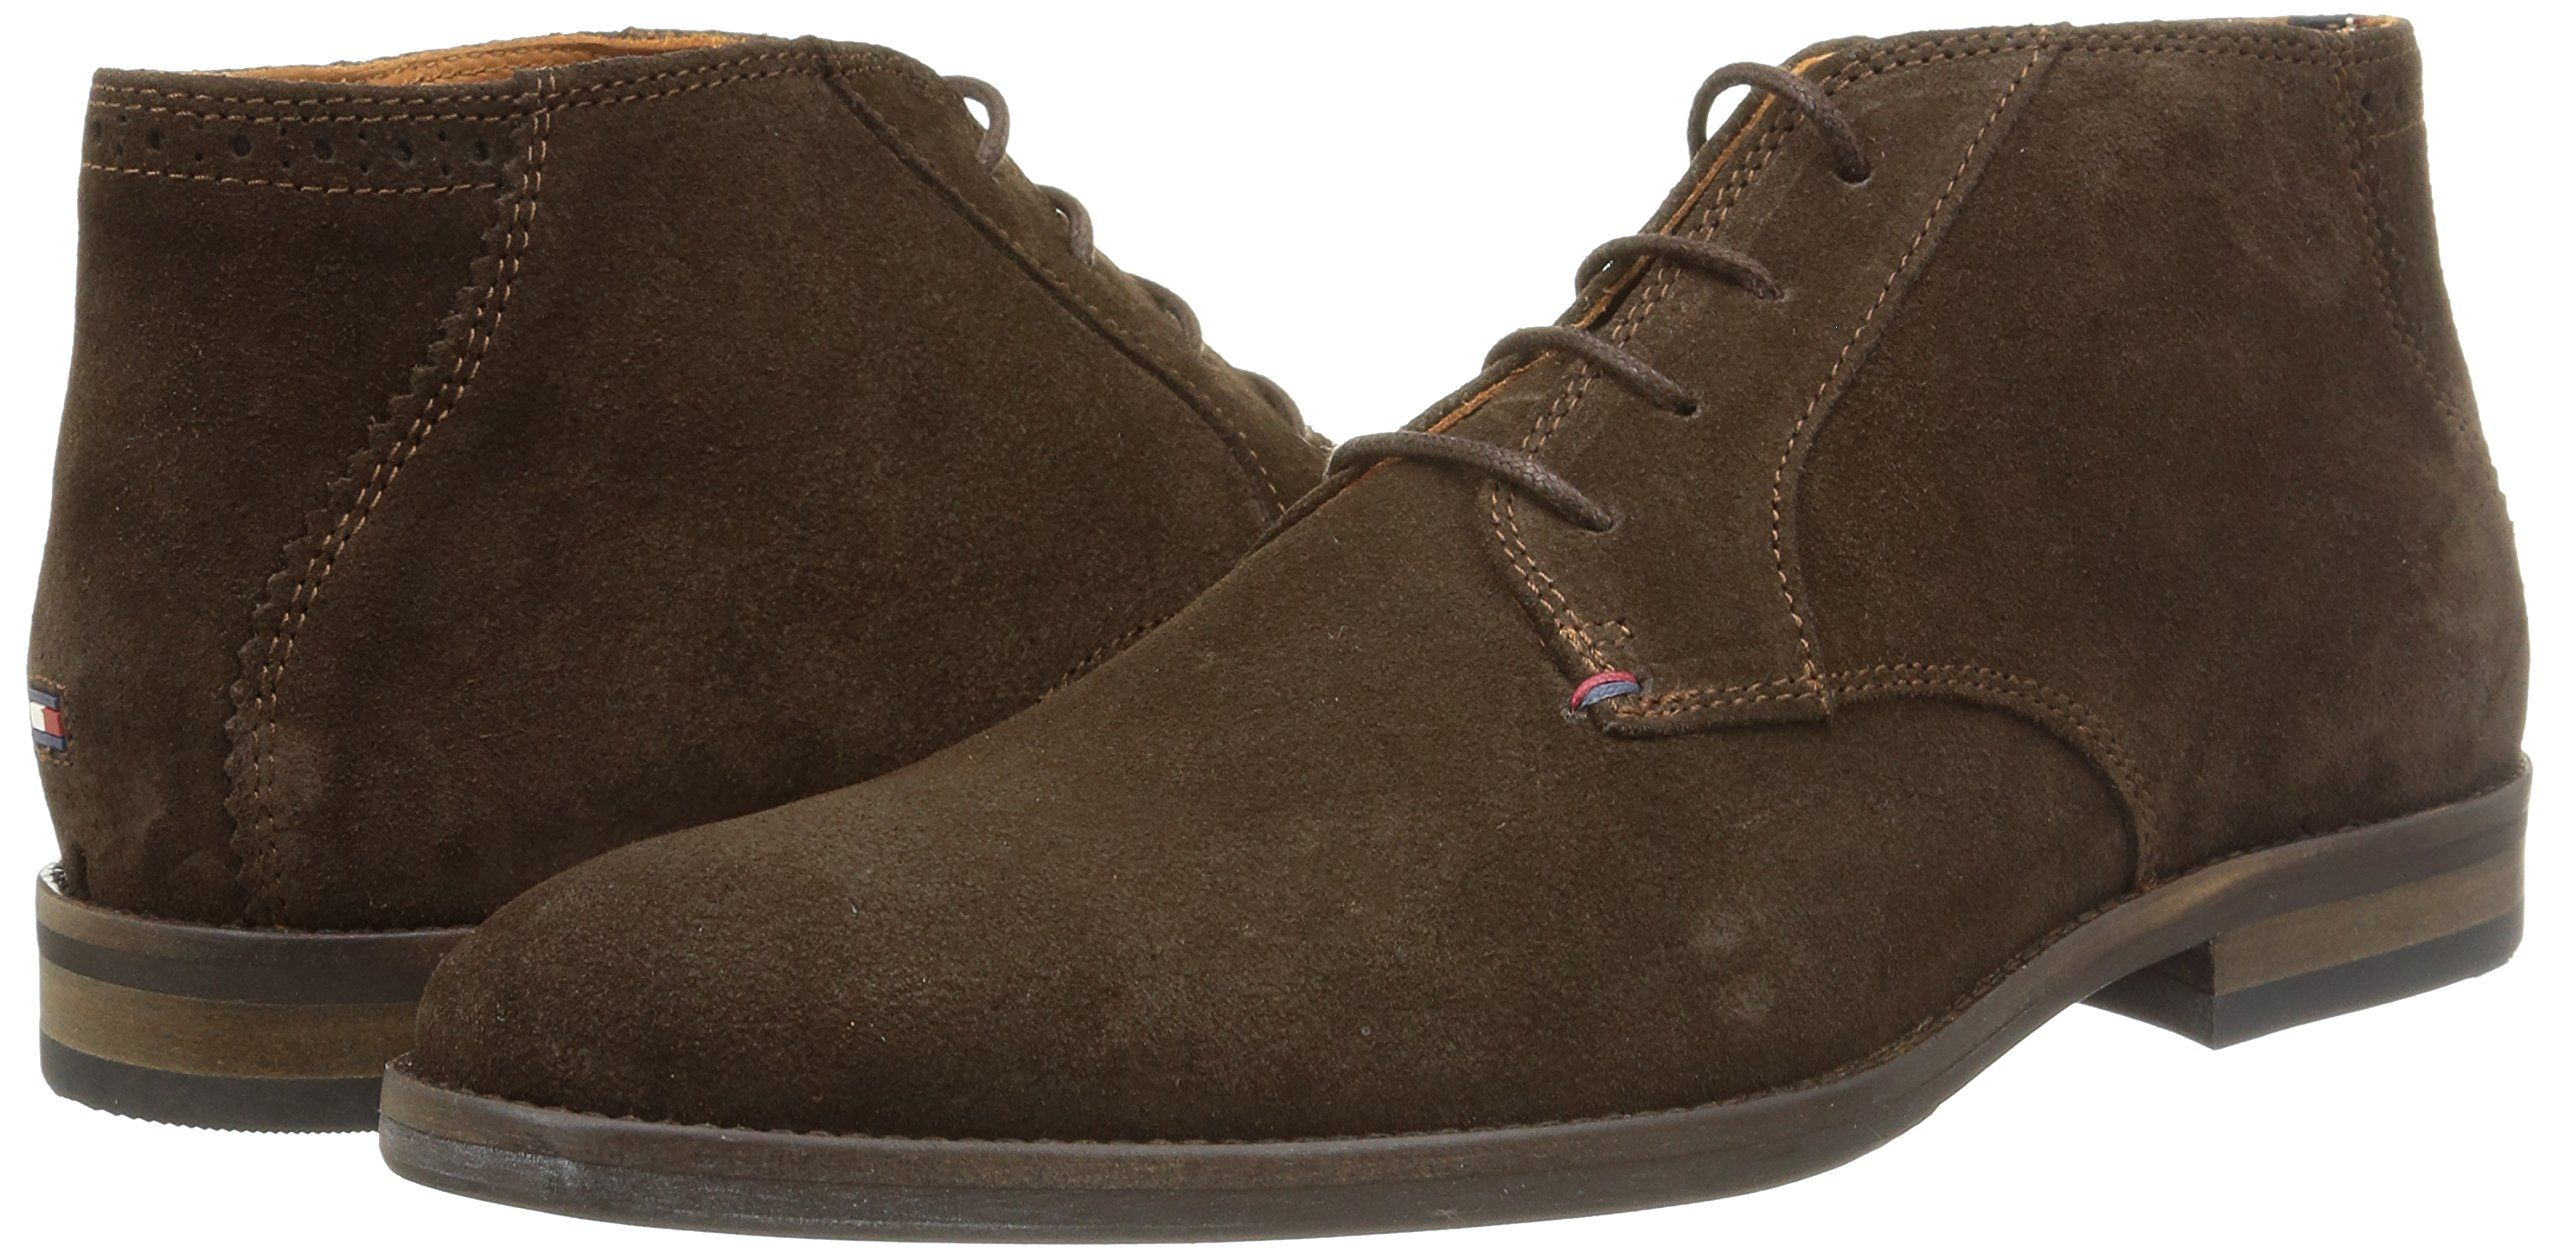 14bebae0088 Tommy Hilfiger Men's DALTON 16B Cold lined chukka boots short length ...